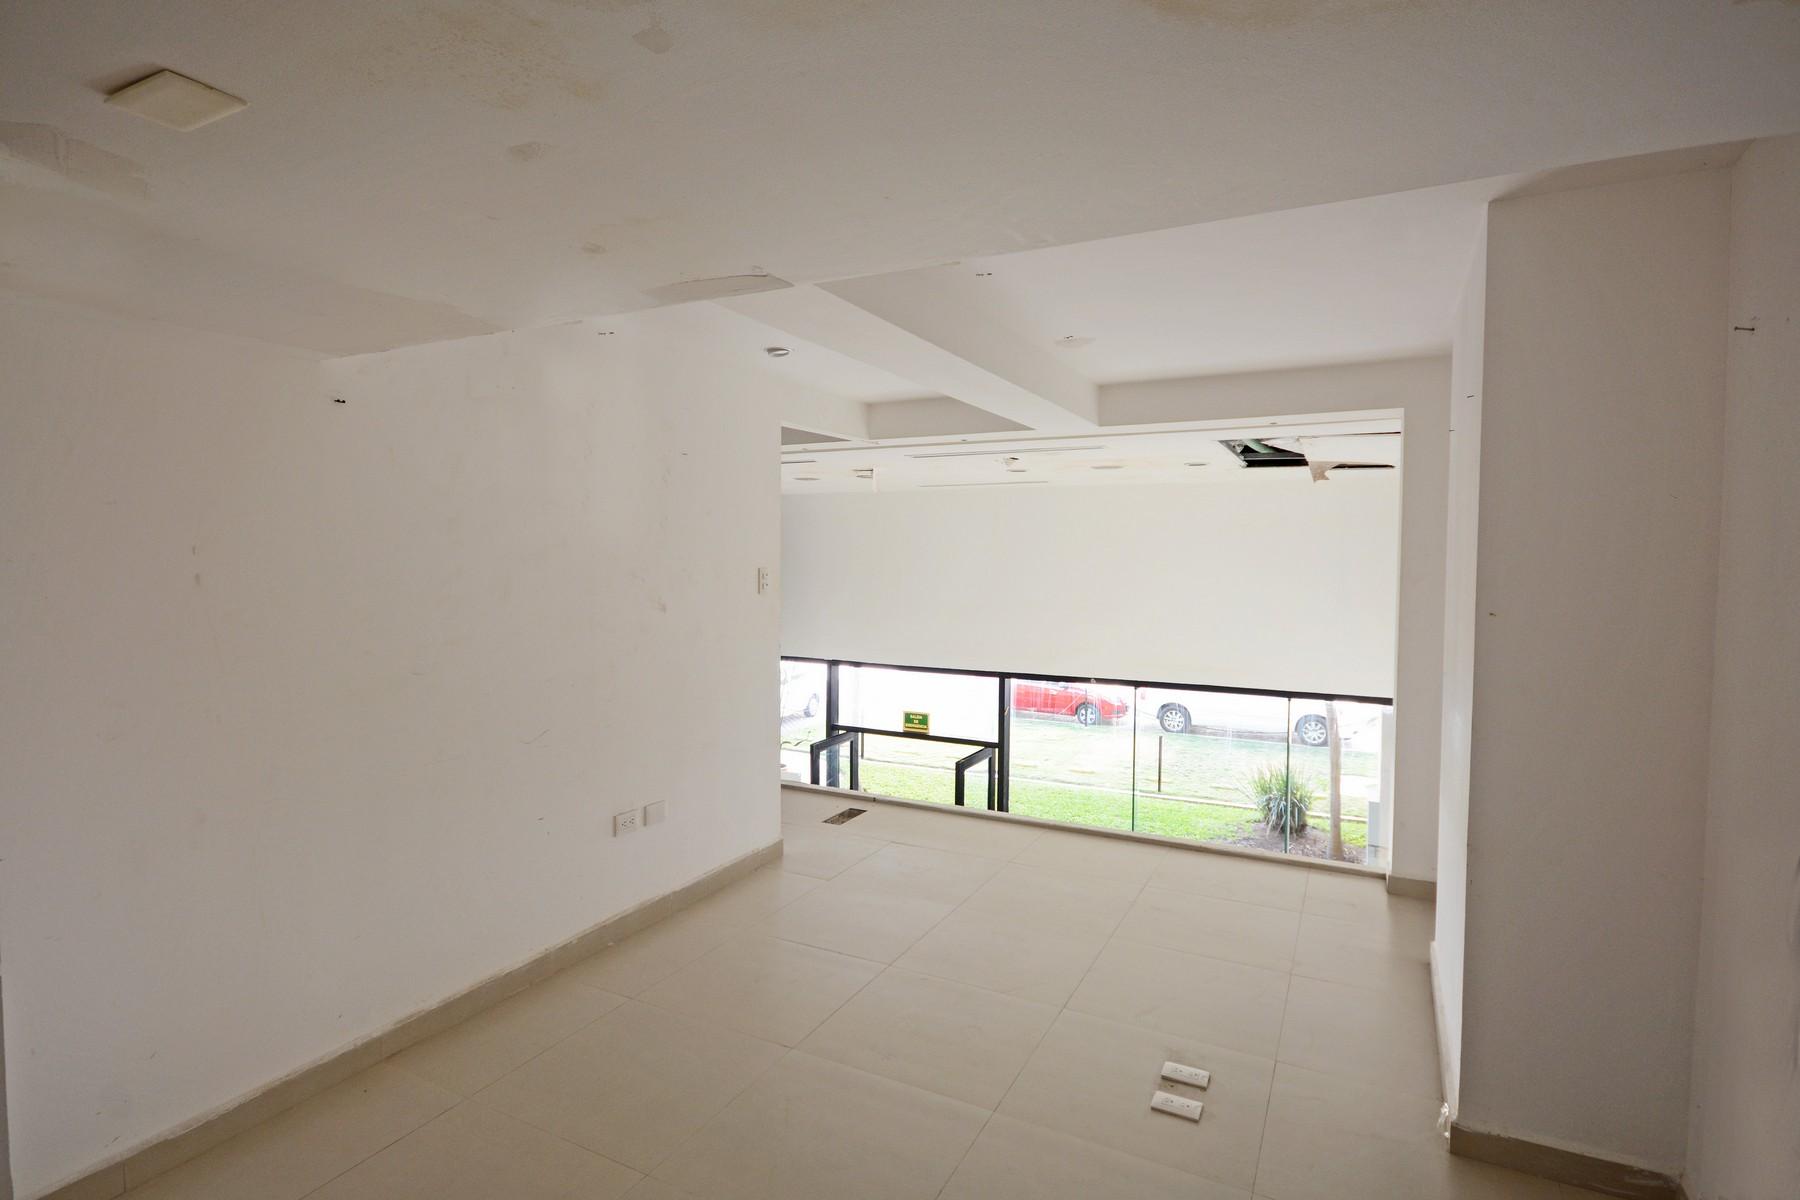 Additional photo for property listing at LOCAL 23 ALDEA THAI Aldea Thai #23 Avenida Cozumel entre las Calles 26 y 28 Norte Playa Del Carmen, Quintana Roo 77710 México